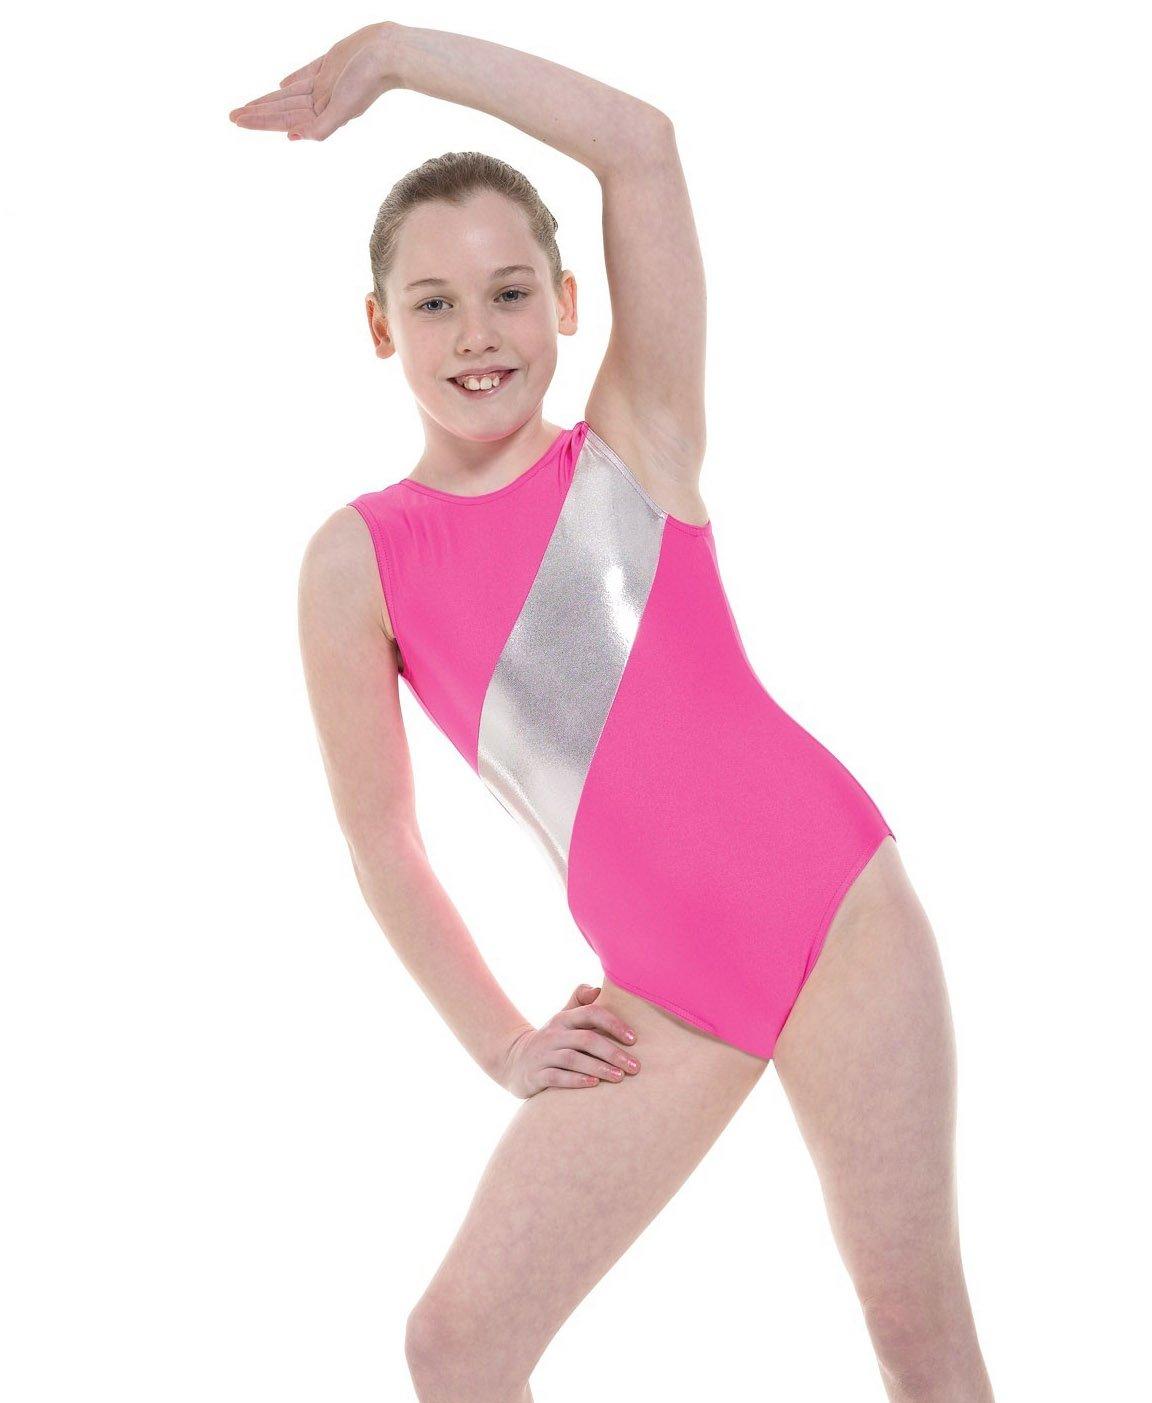 df955bc94 Girls Gymnastics Leotard Sleeveless Lycra with Silver Stripe GYM5 ...